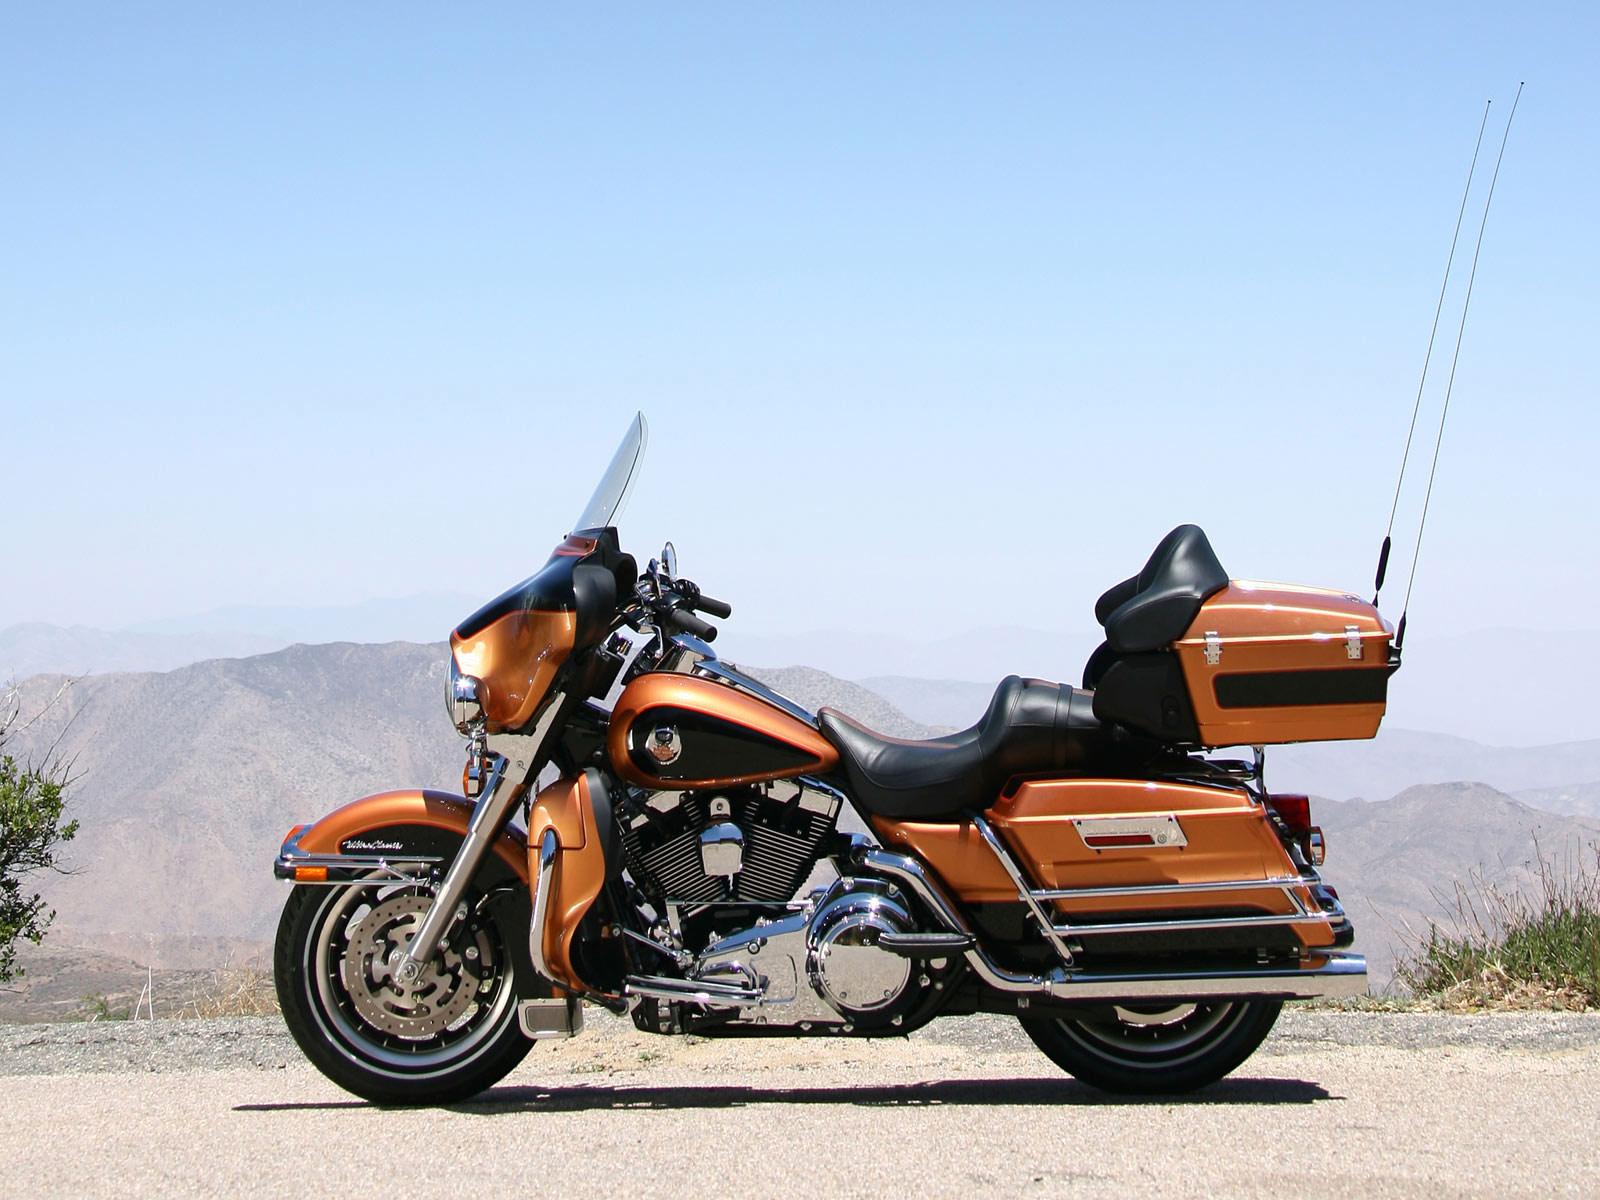 Harley Davidson 2008: 2008 Harley-Davidson FLHTCU Ultra Classic Electra Glide